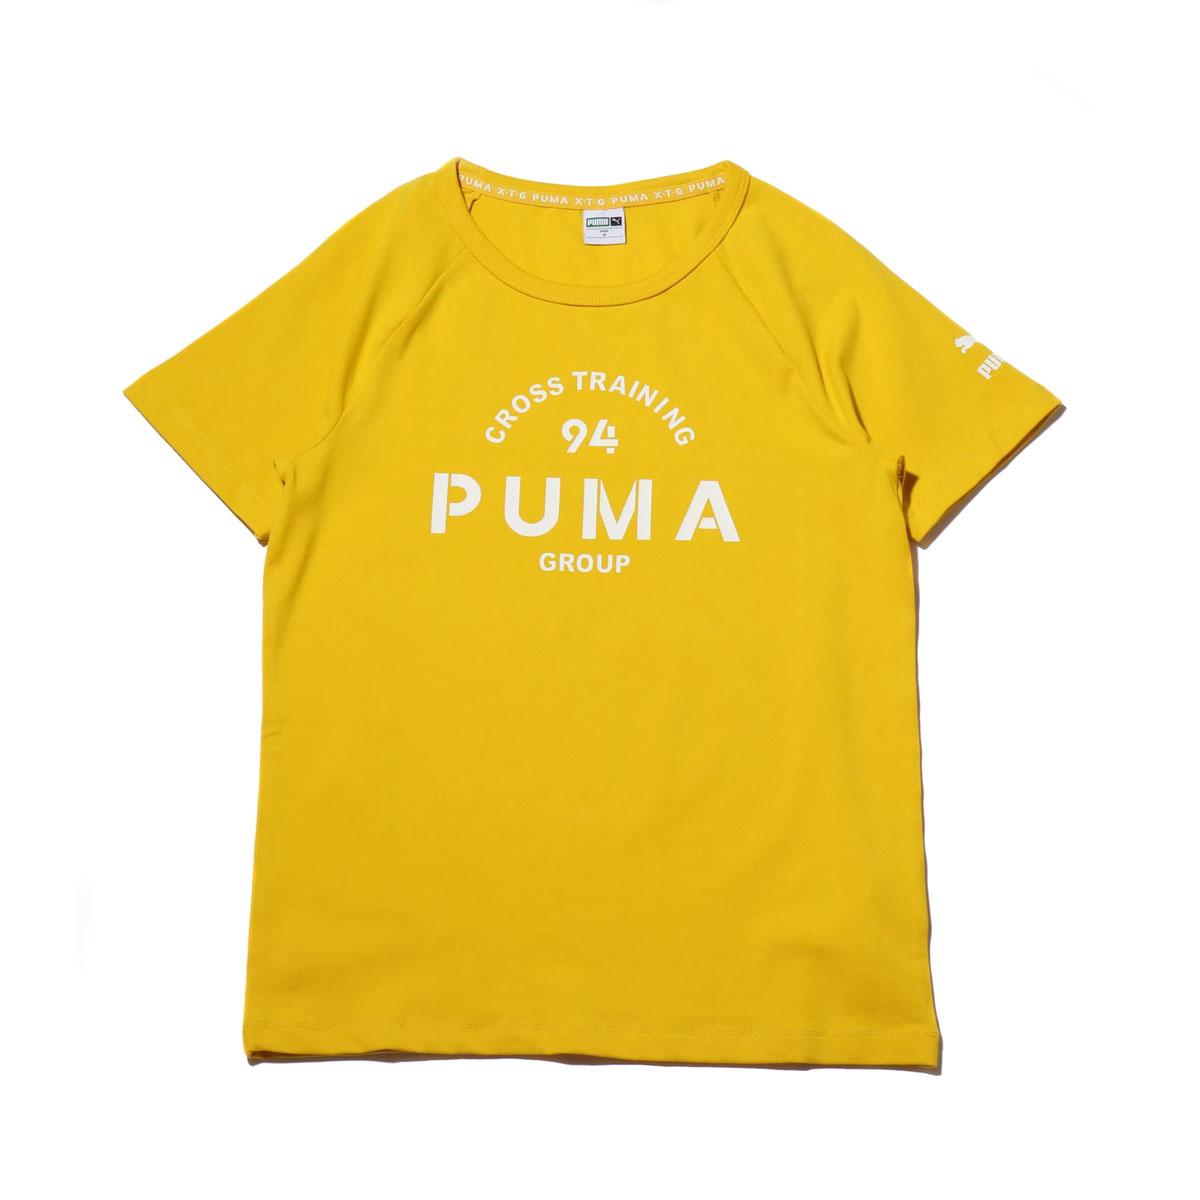 8f63030dba PUMA XTG GRAPHIC SS TEE (SULPHUR) (Puma XTG graphic short sleeve T-shirt)